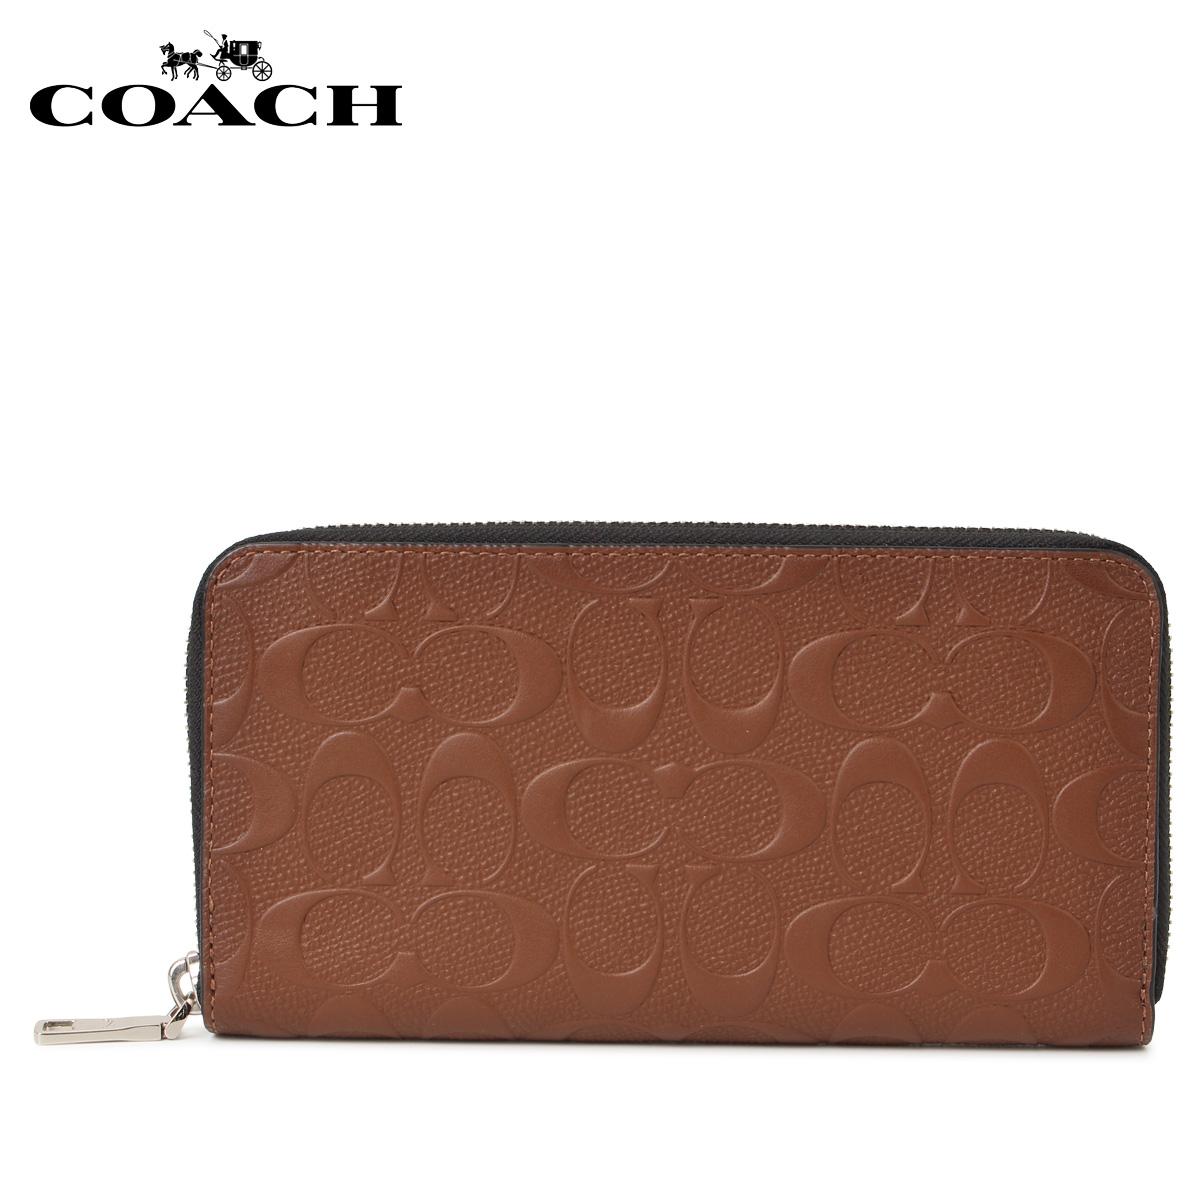 COACH F24667-SAD コーチ 財布 長財布 メンズ ラウンドファスナー シグネチャー ブラウン